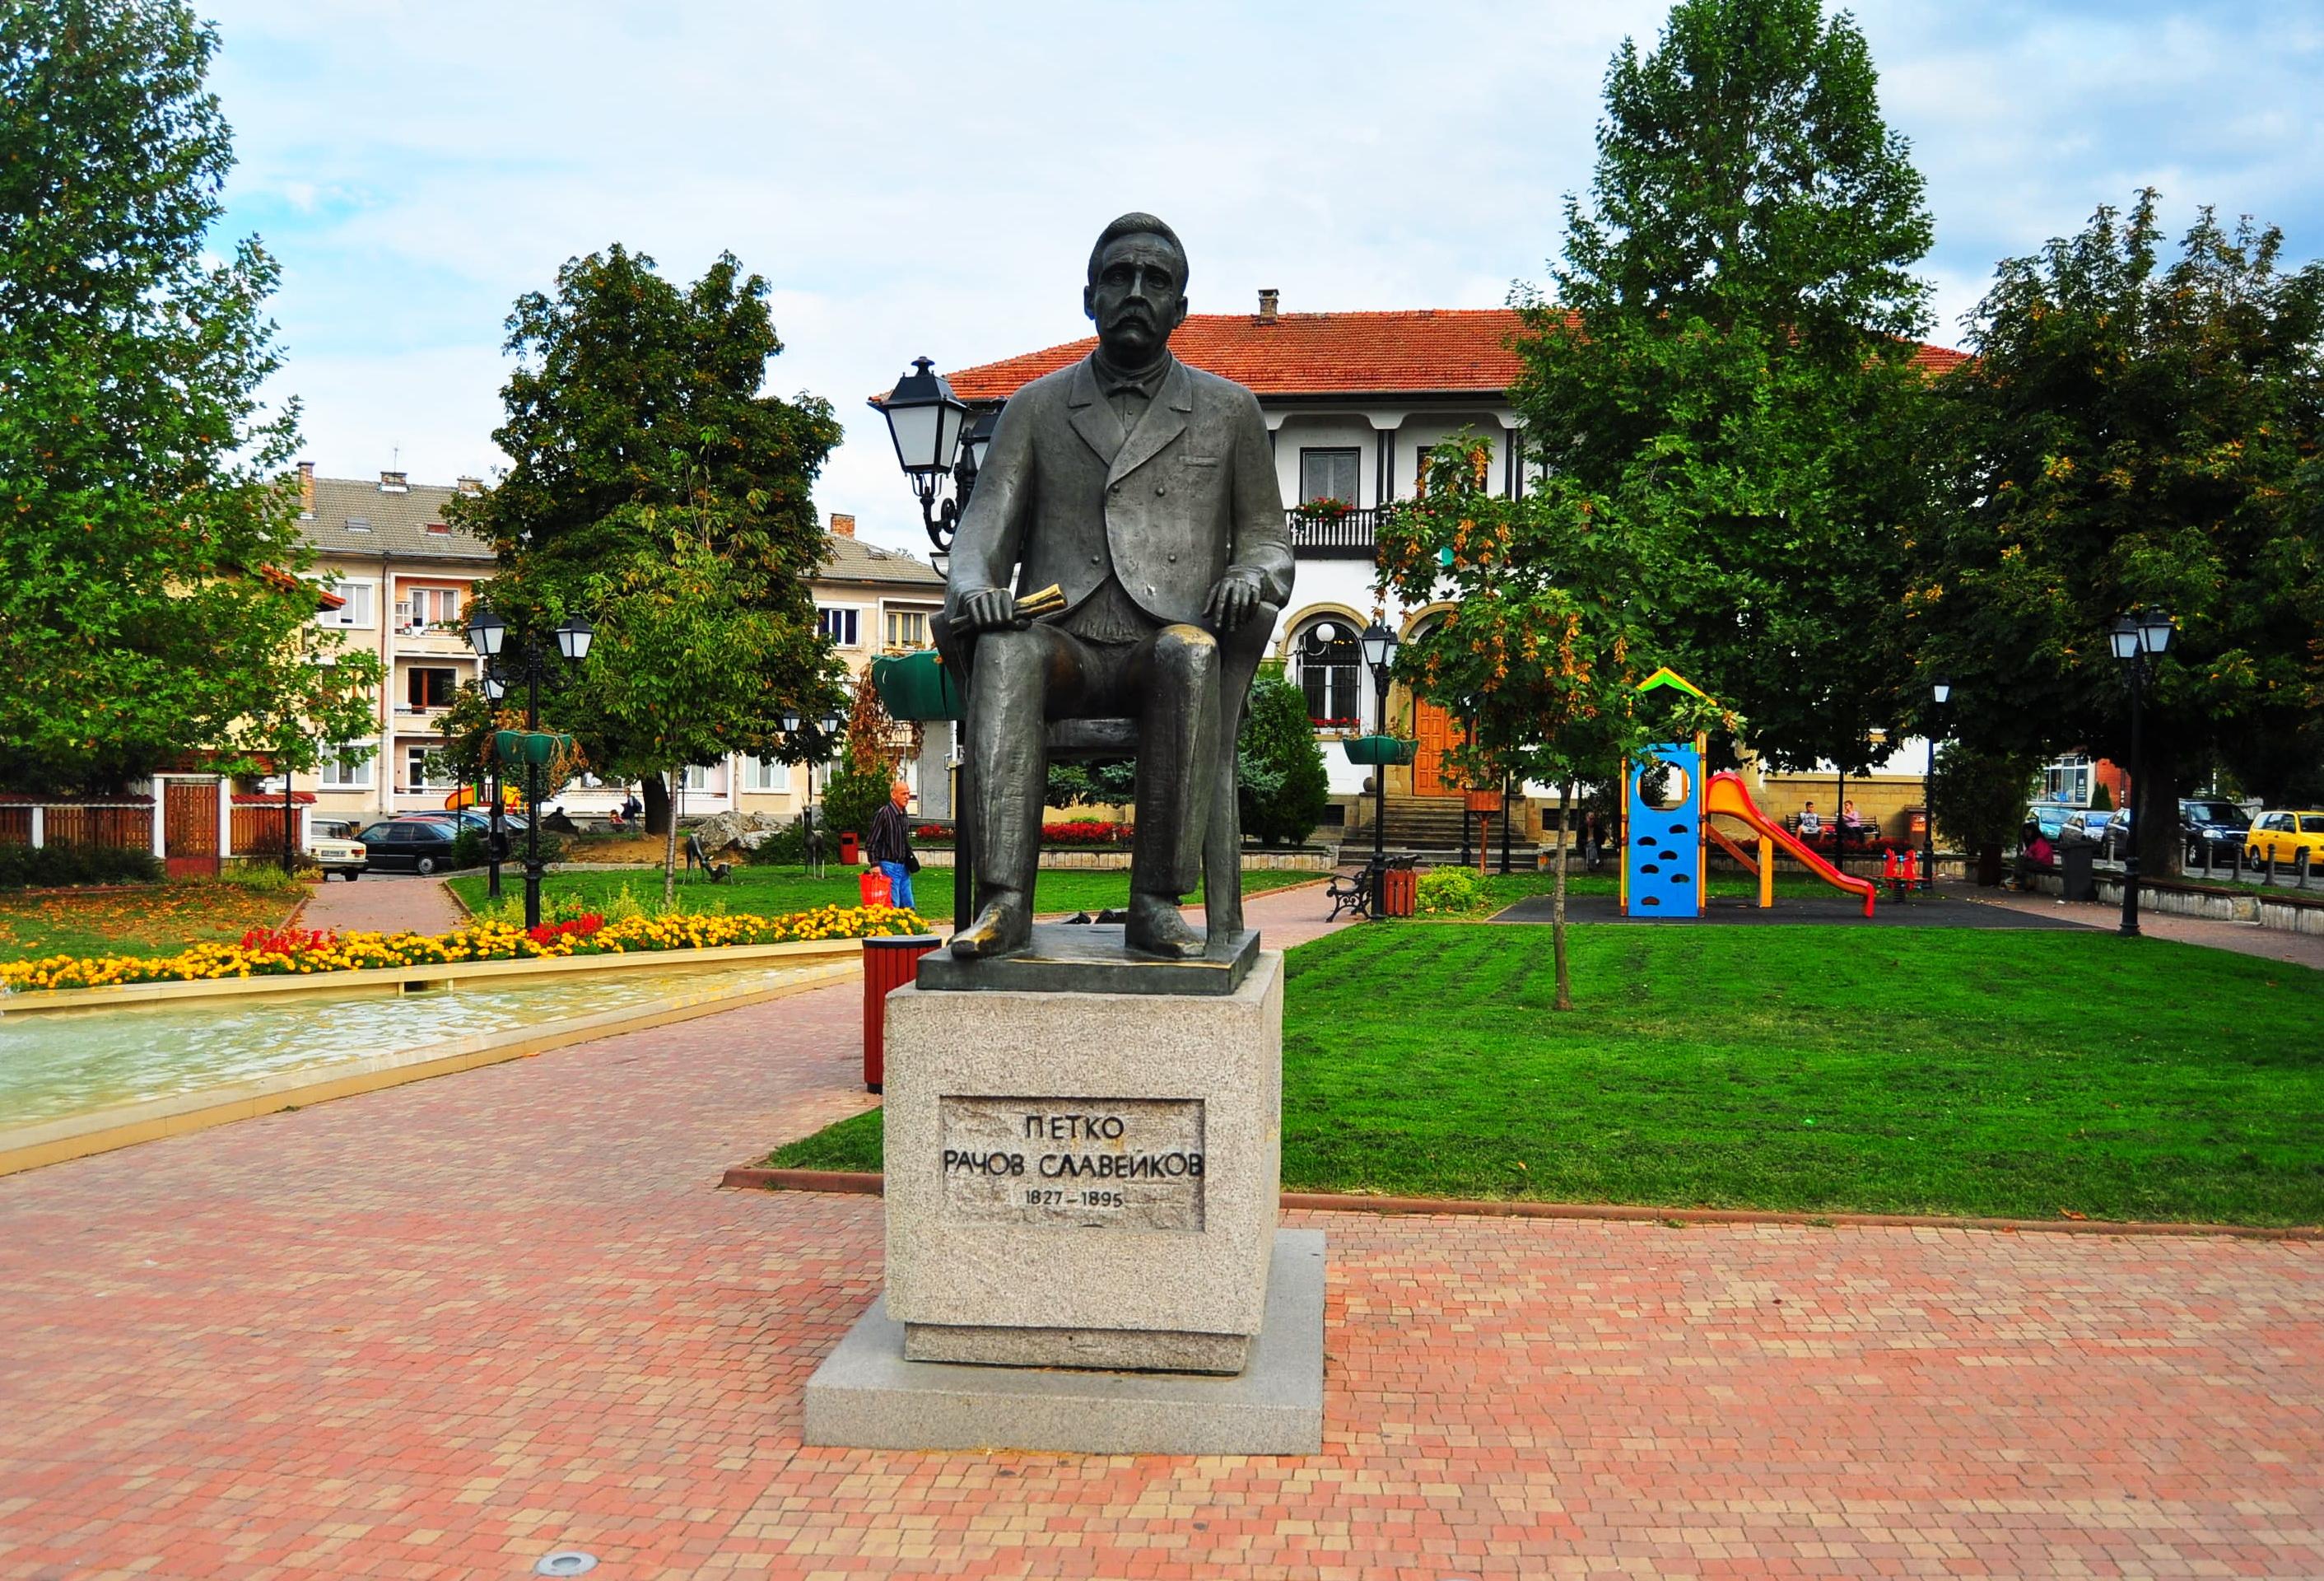 Statuia lui Petko Slaveykov. Tryavna. Bulgaria